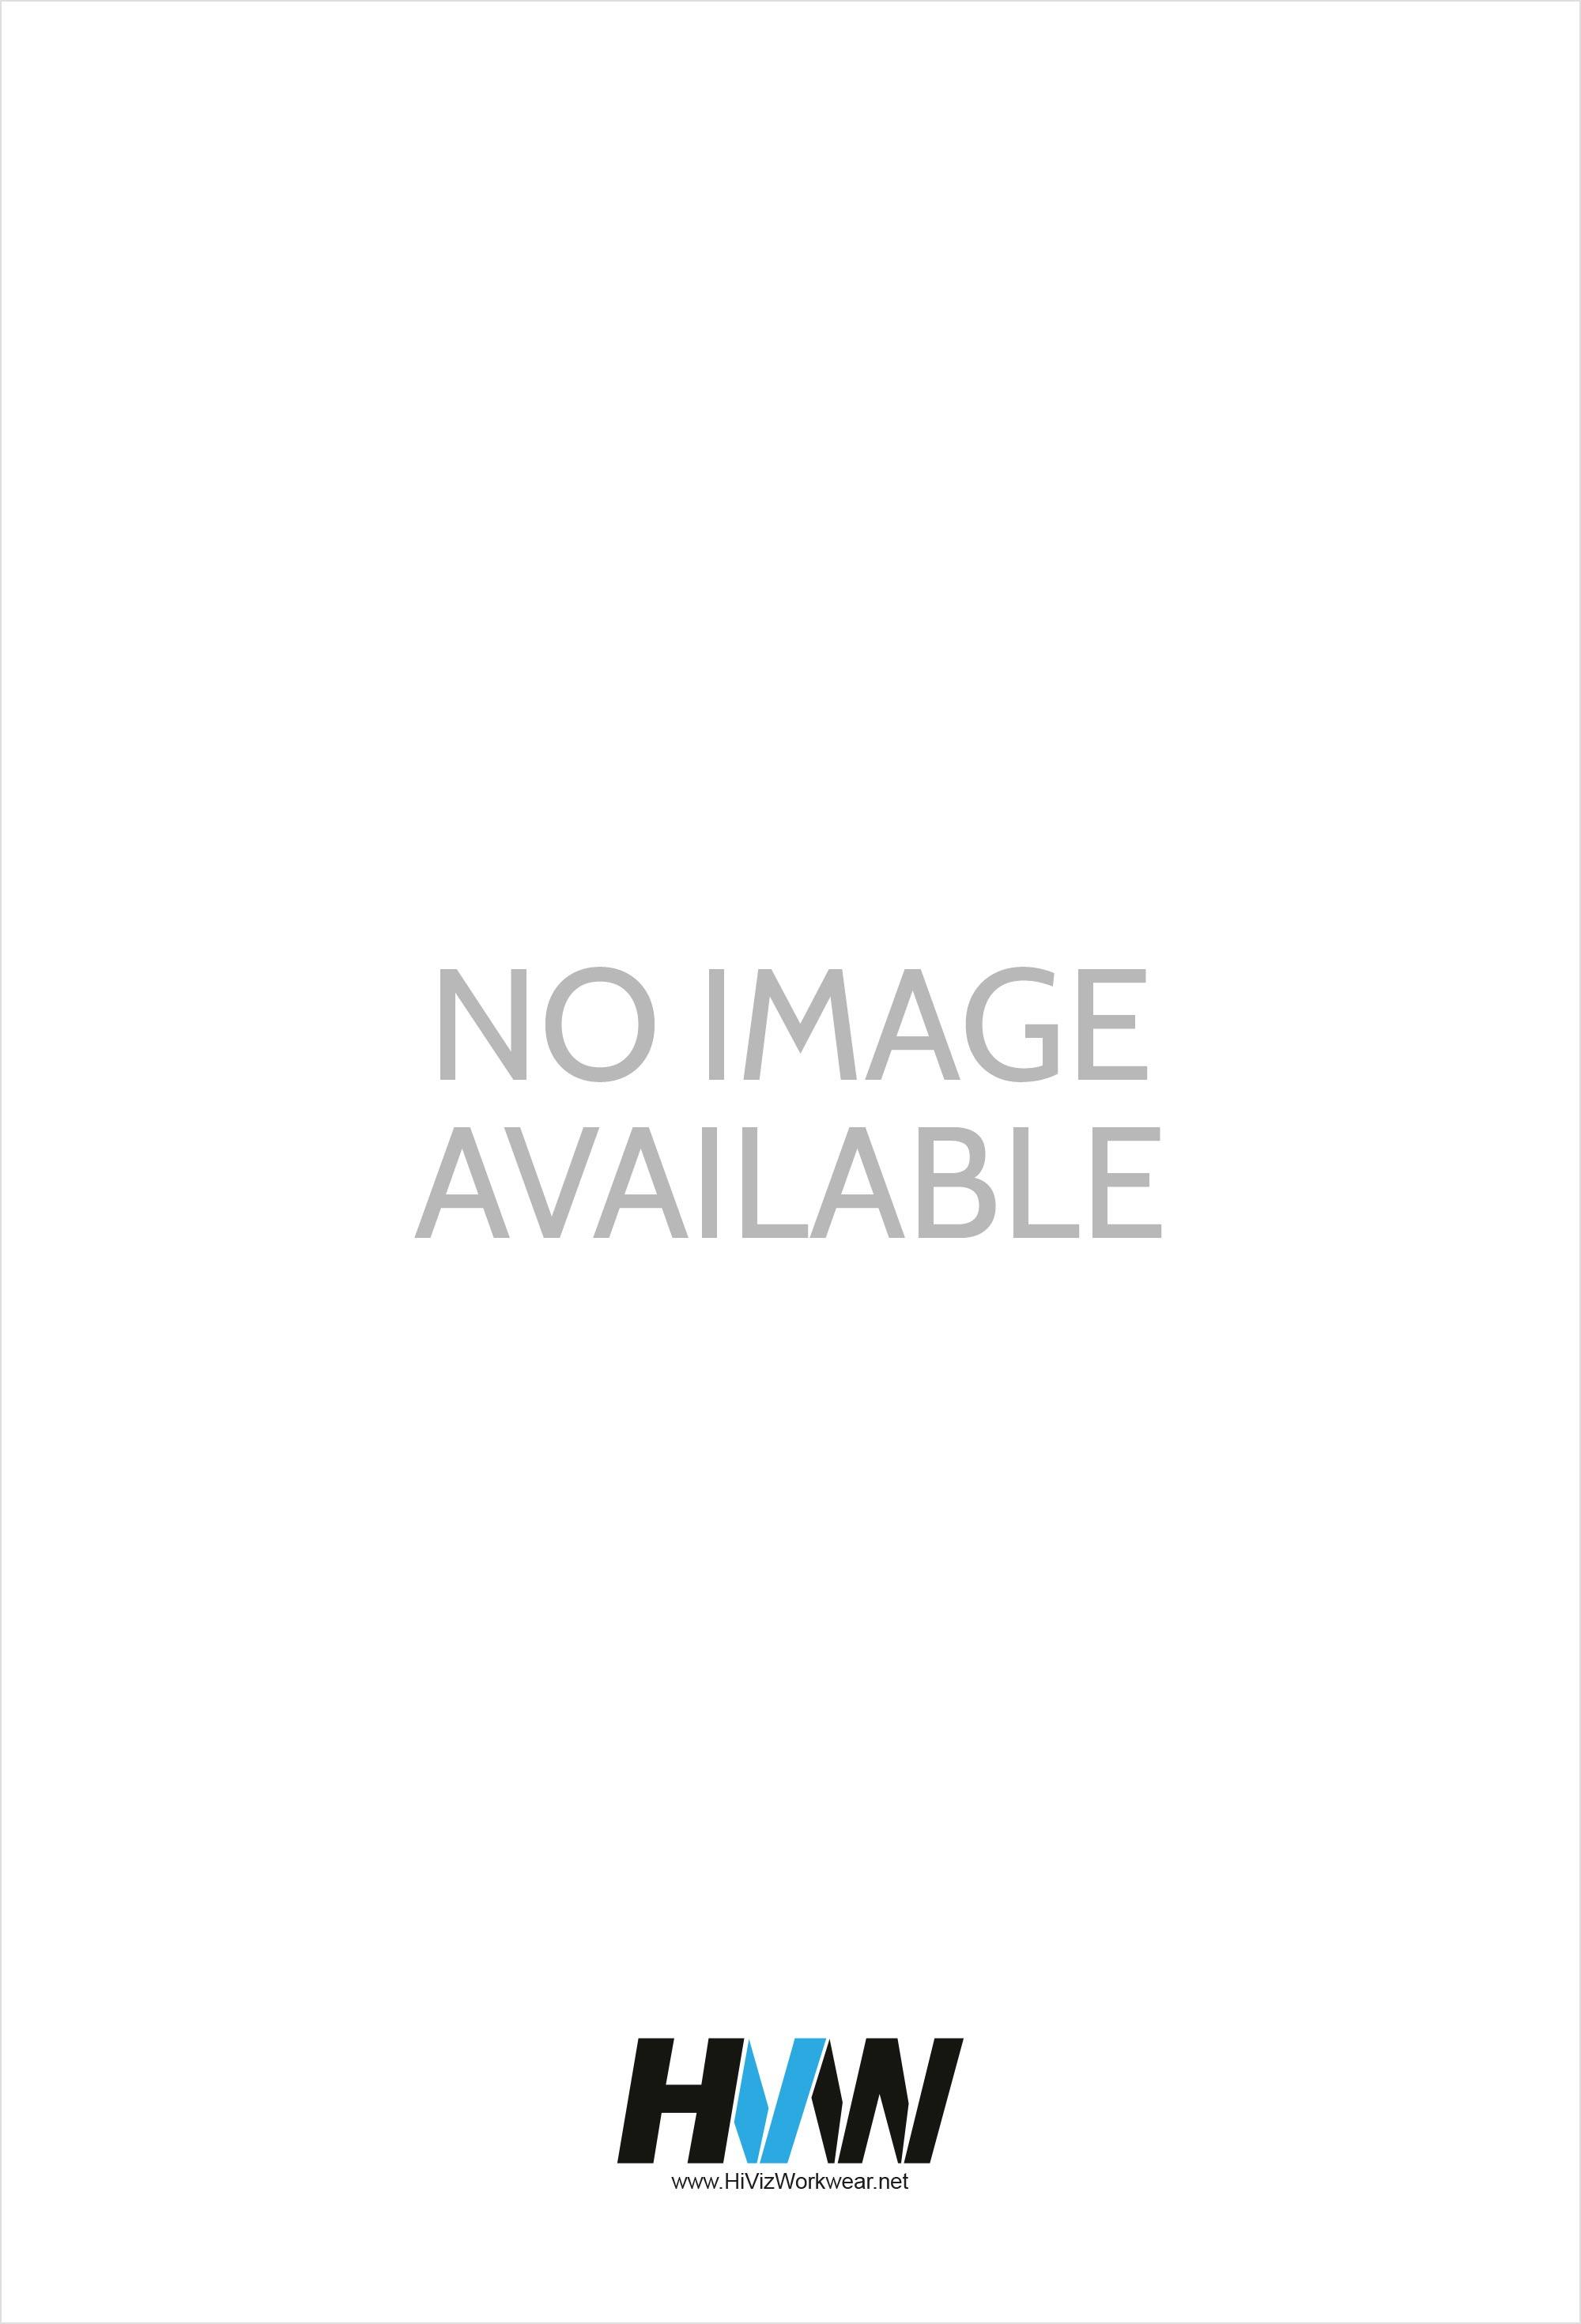 Russell 7620M QClassic Sweatshirt (XSmall to 4XL)